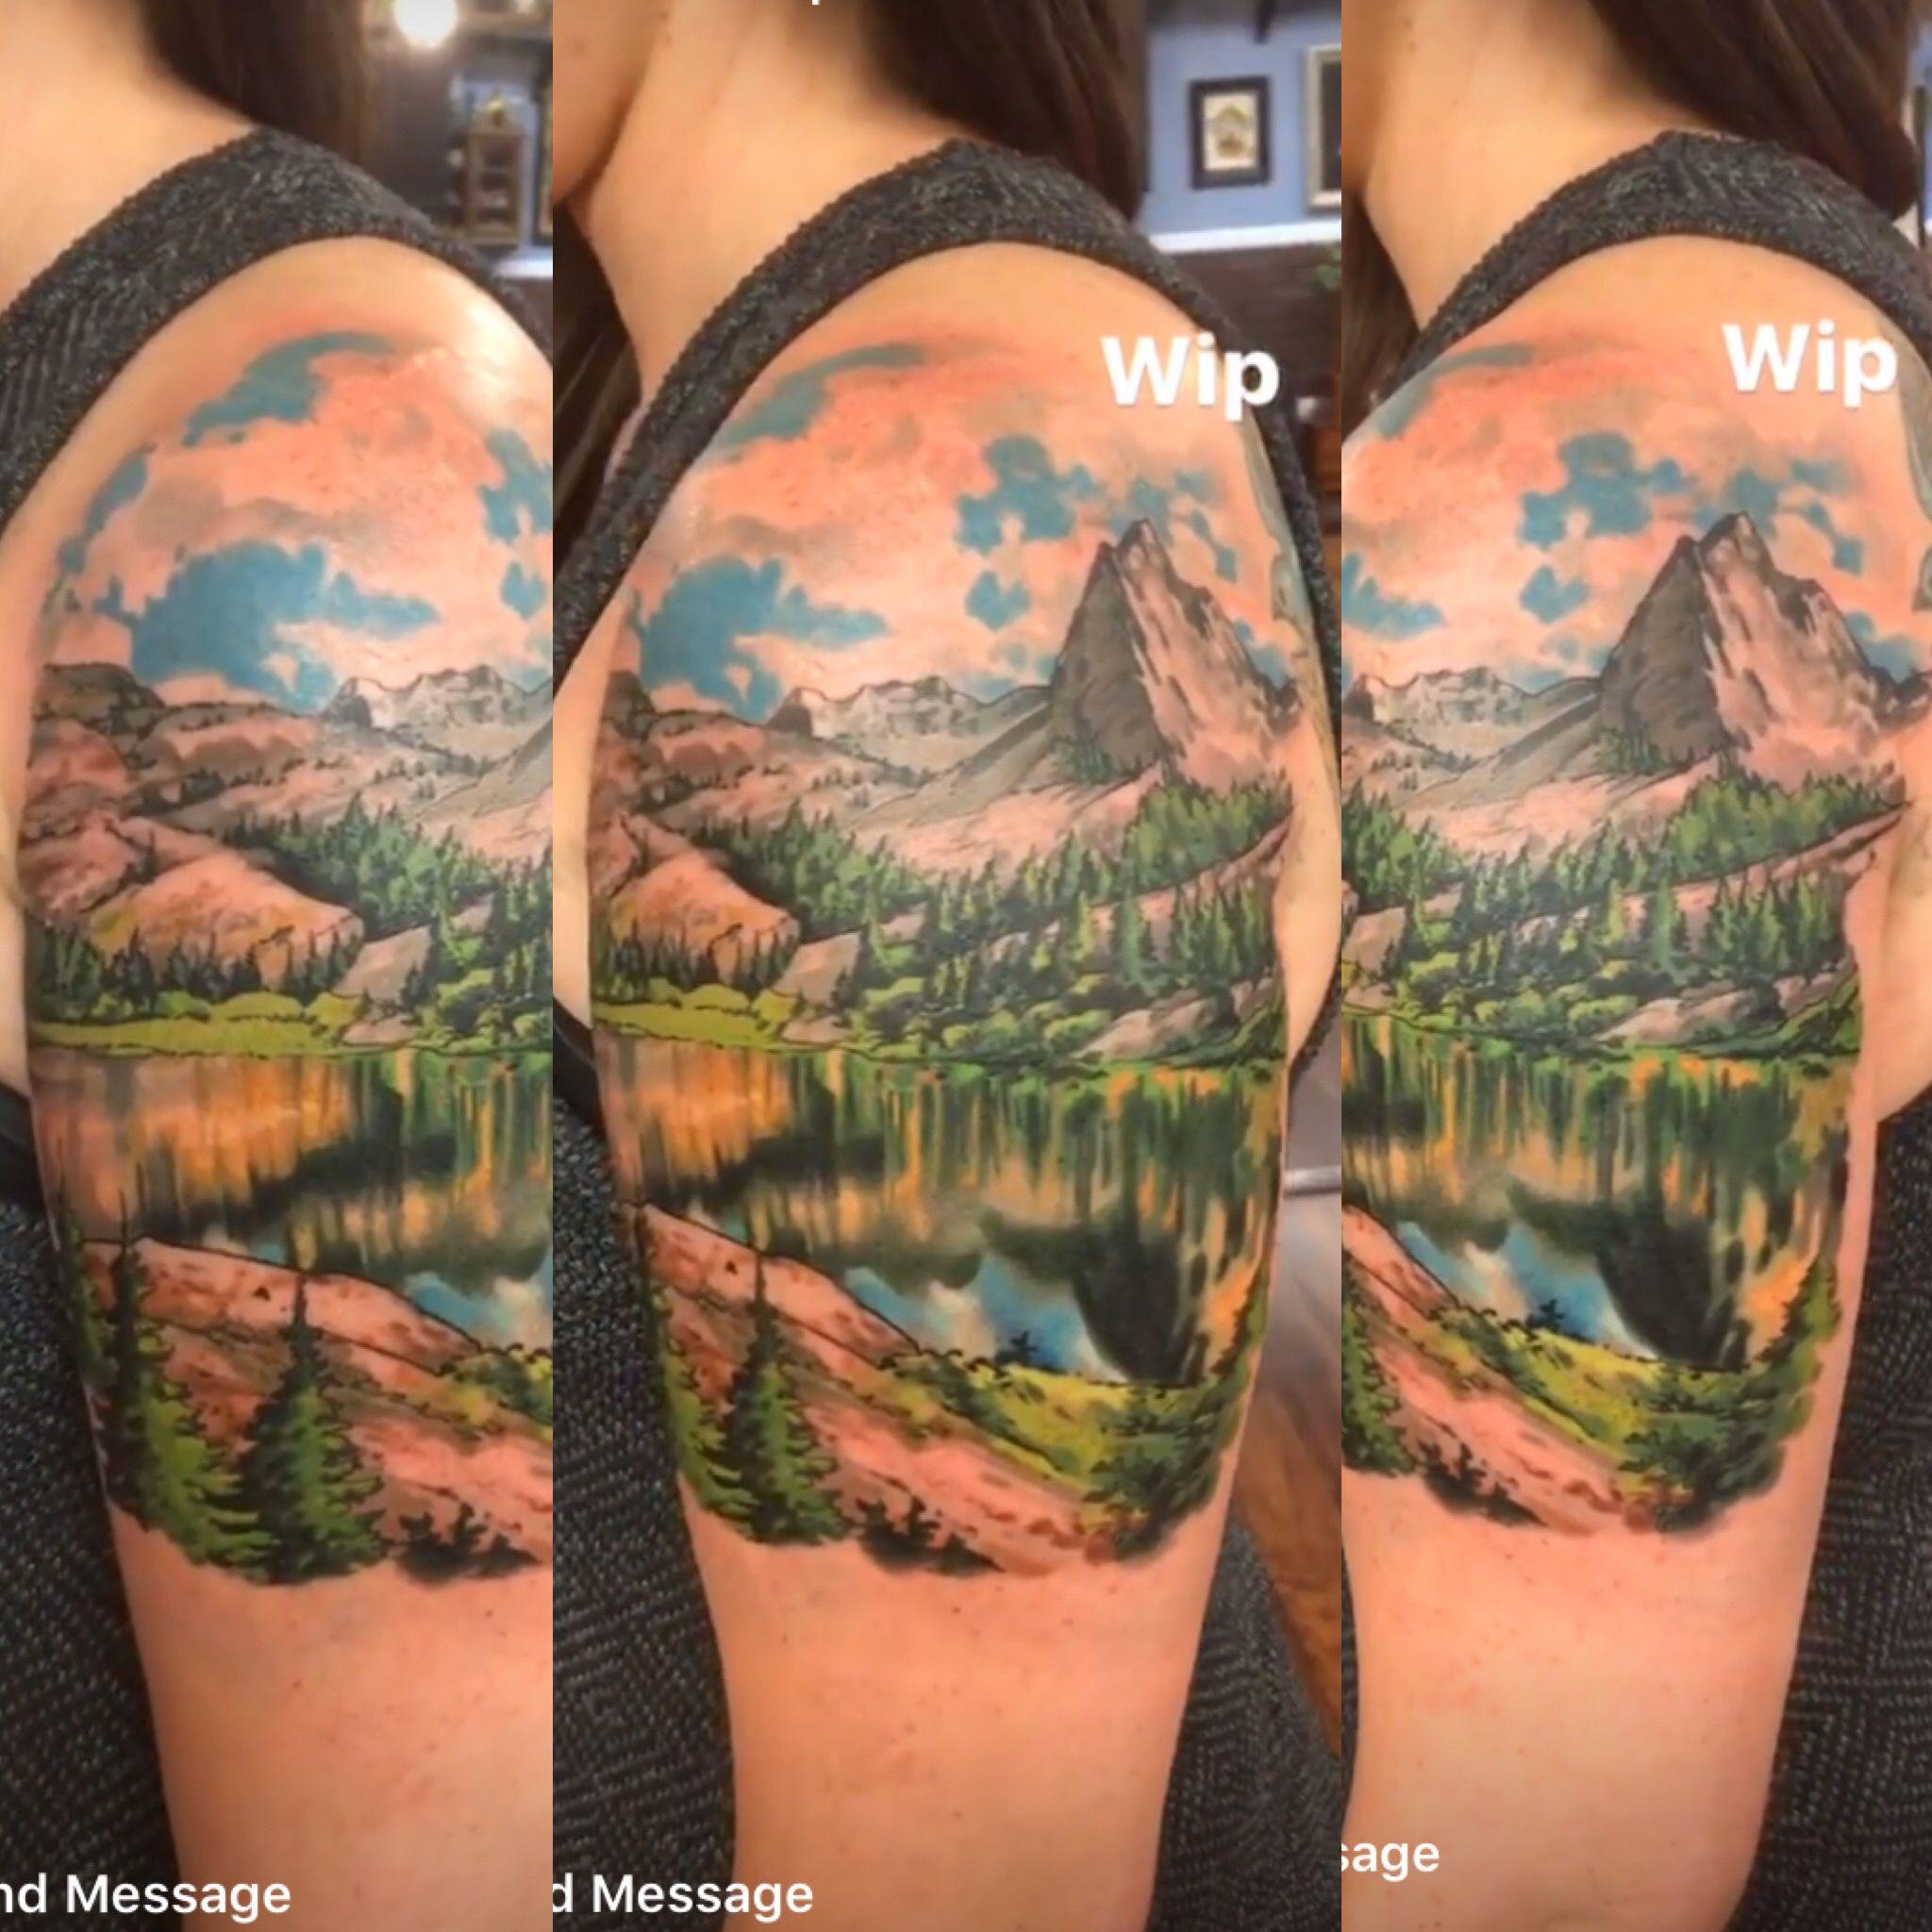 my tattoo utah mountains tattoo tattoo trees mountains lake utah trail hiking tattoo. Black Bedroom Furniture Sets. Home Design Ideas